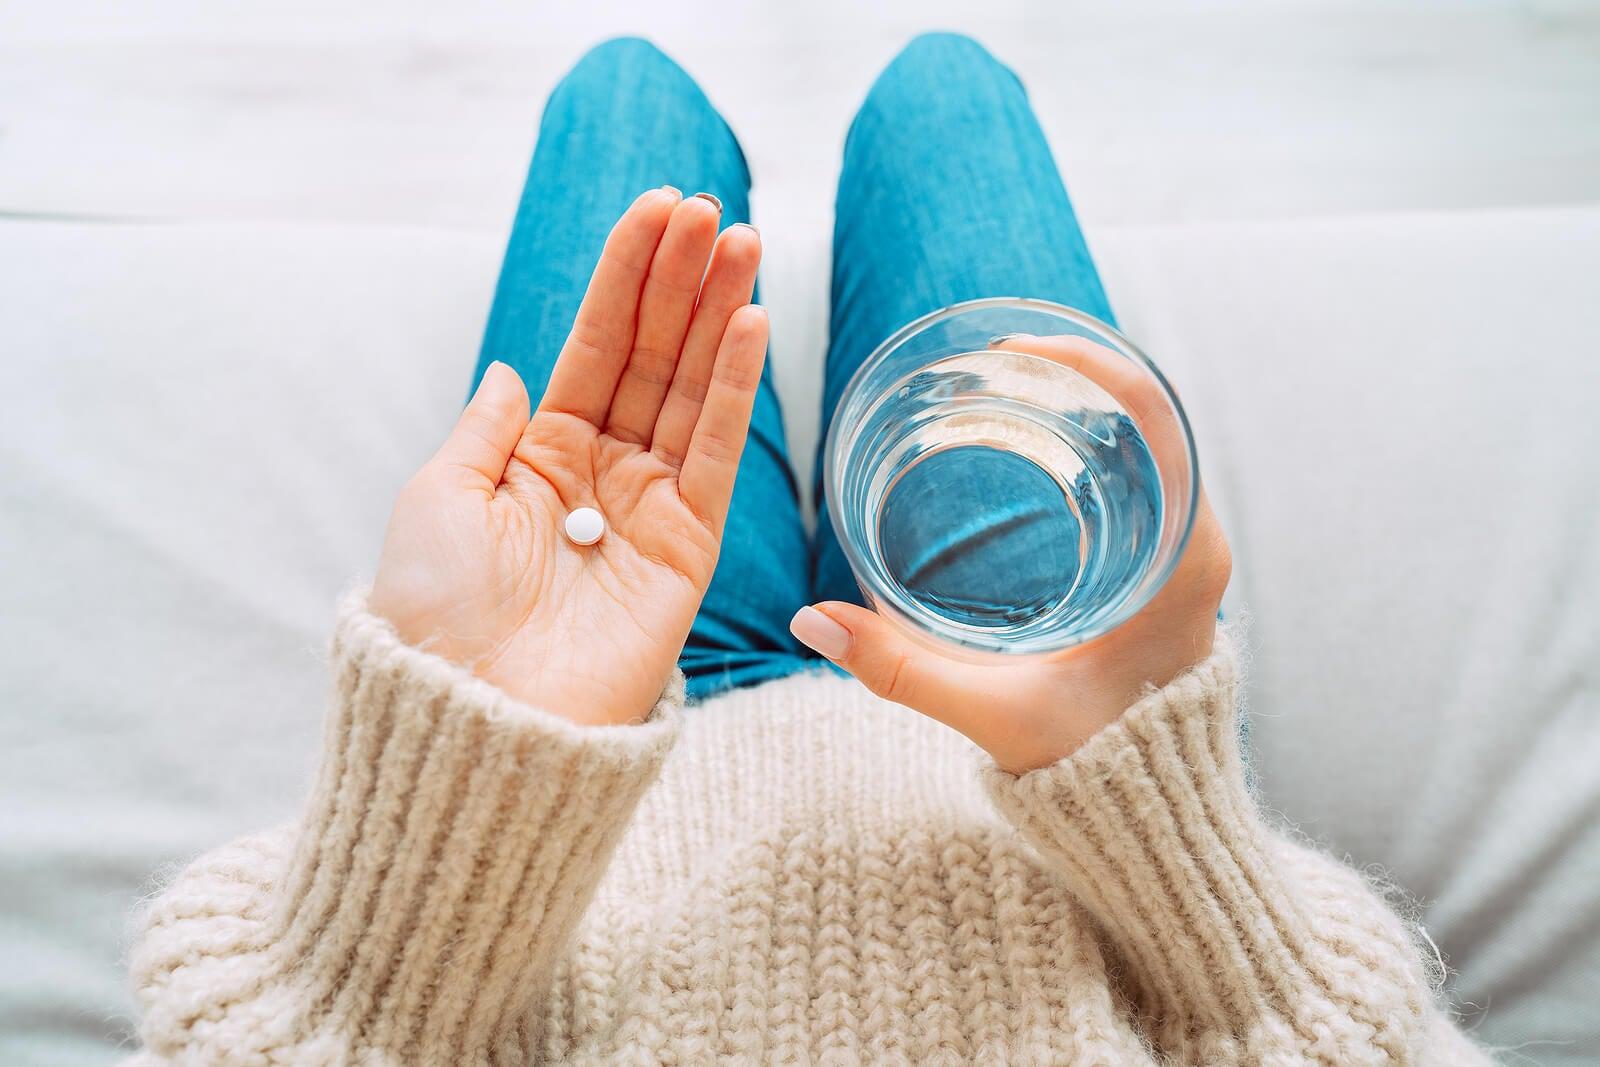 Diarrea relacionada con antibióticos